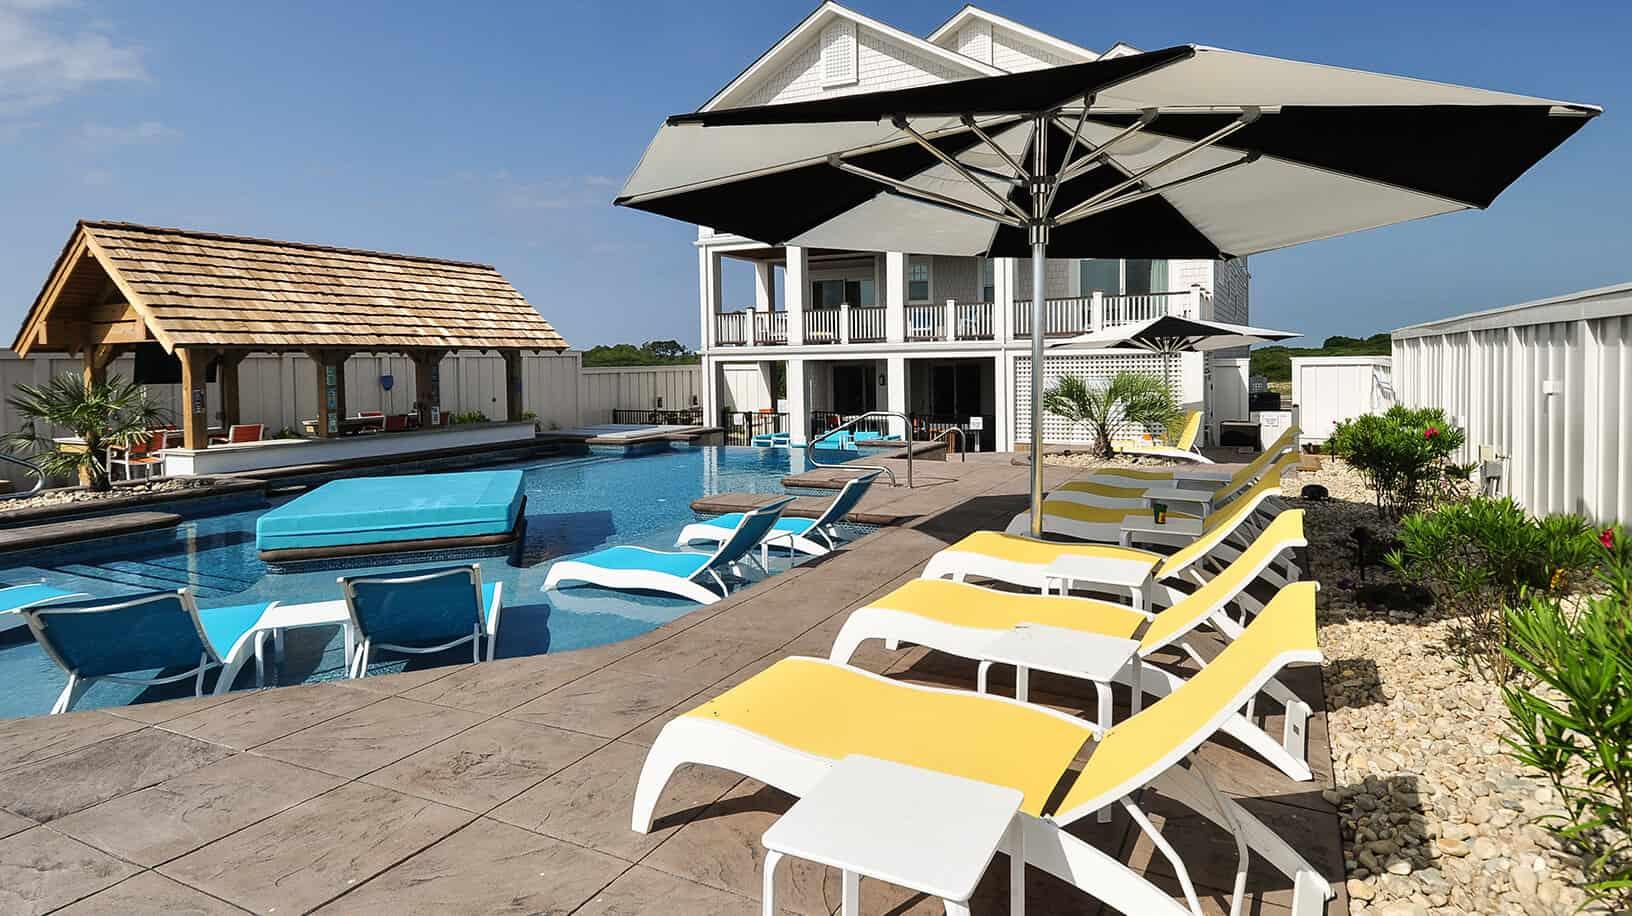 daniels homeport coastal furnishings indoor and outdoor